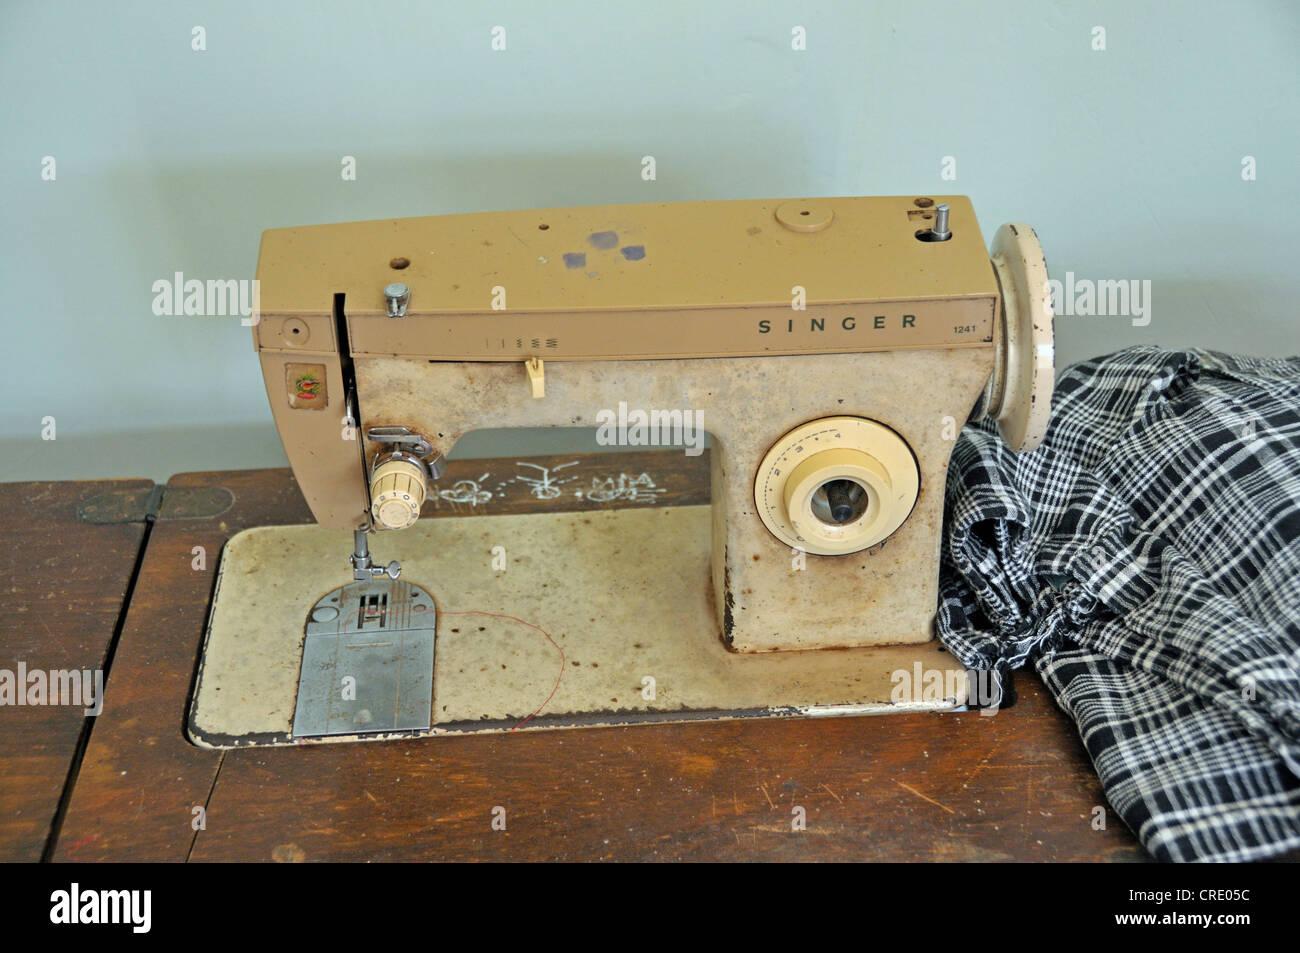 Old Singer Sewing Machine Stock Photos & Old Singer Sewing